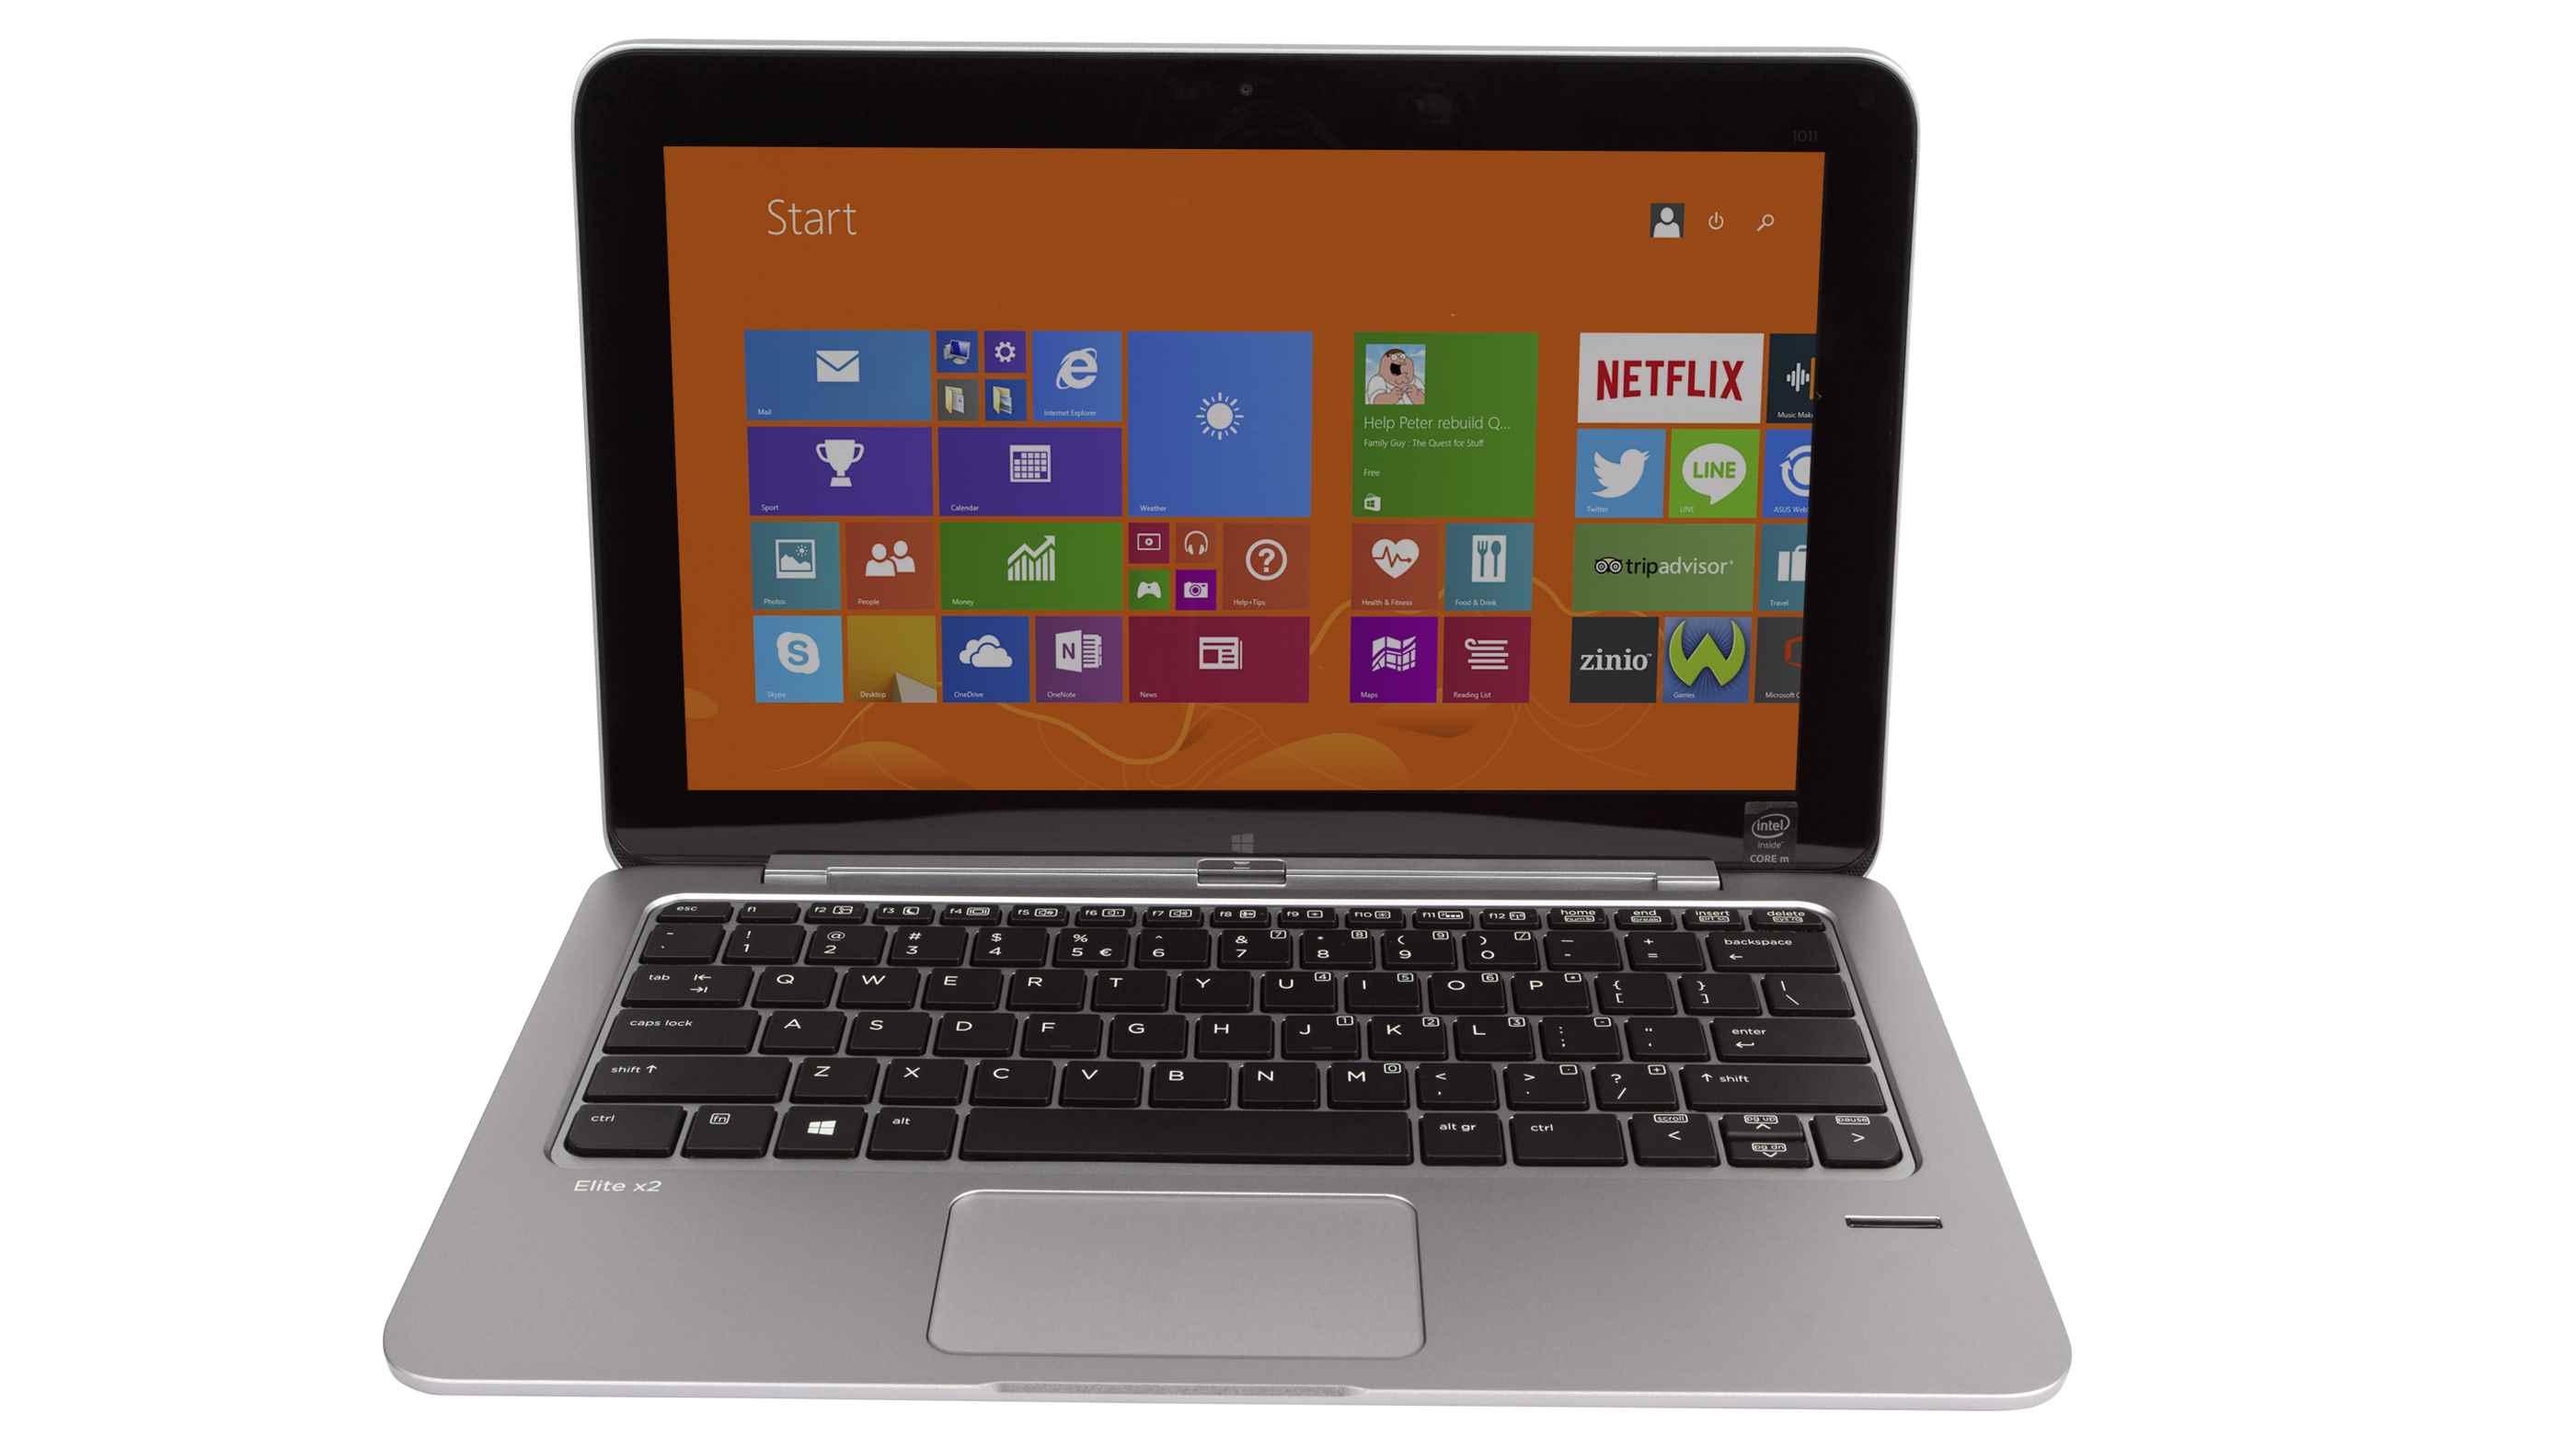 اچ پی / لپ تاپ استوک اچ پی مدل HP Elite x2 1011 G1